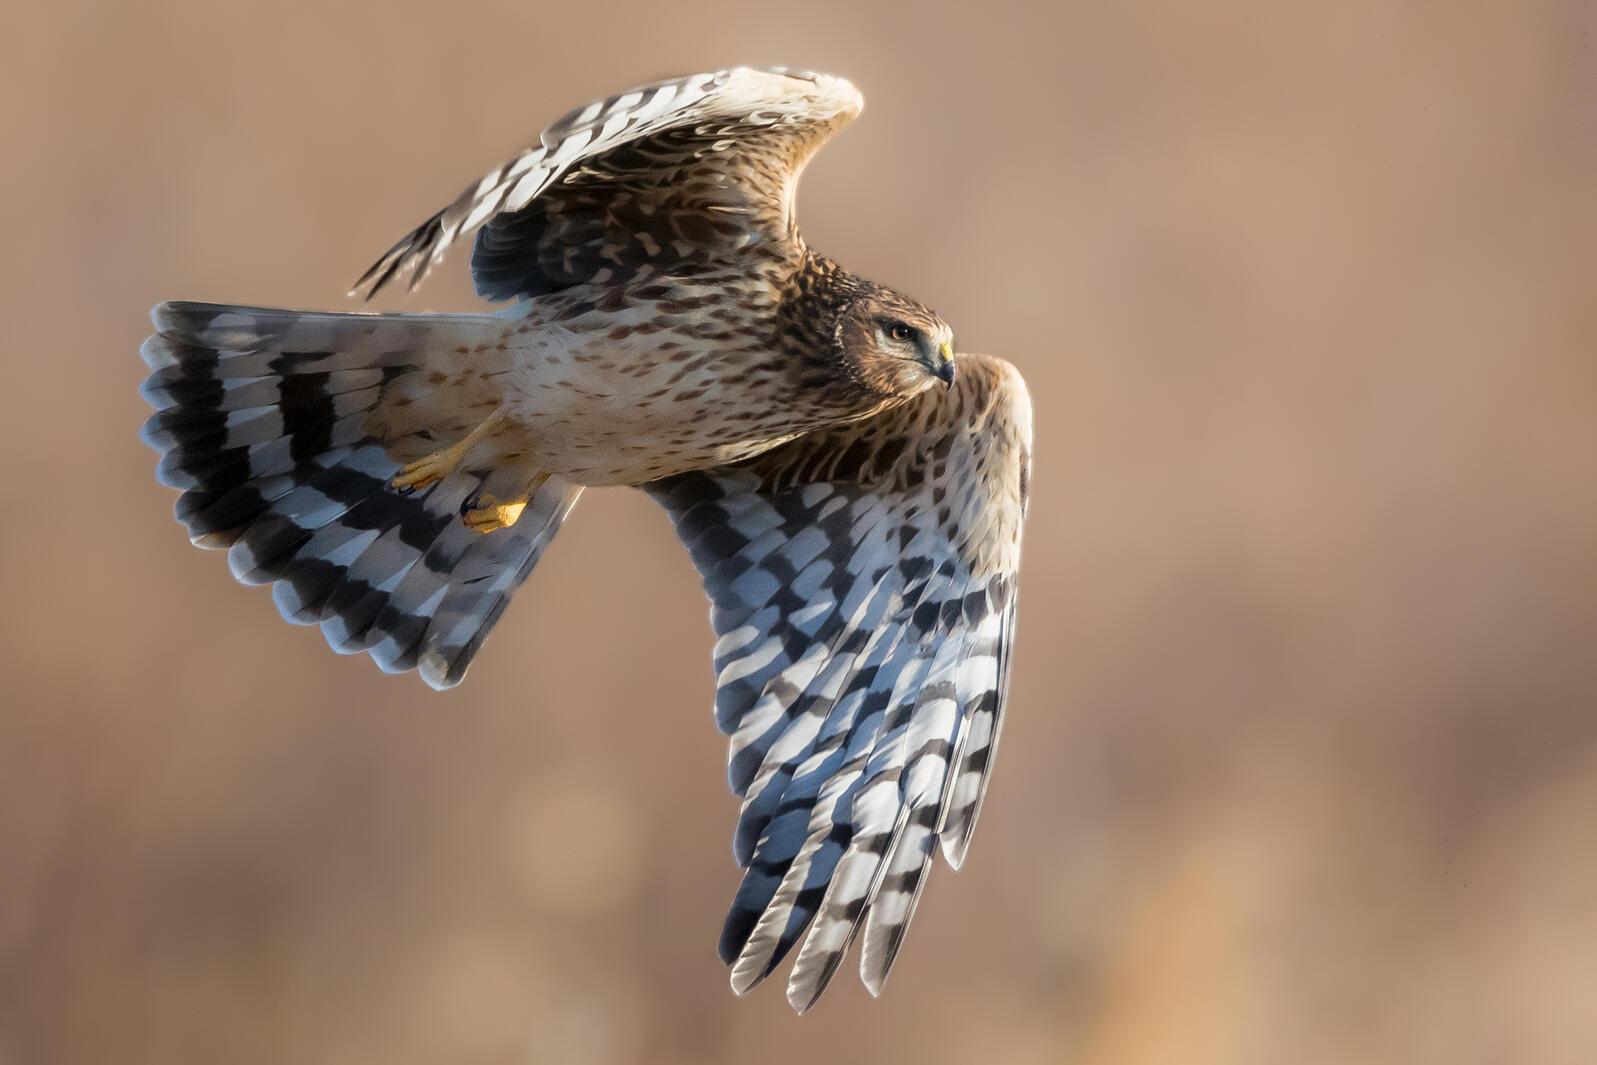 Northern Harrier. Joe Gliozzo/Audubon Photography Awards